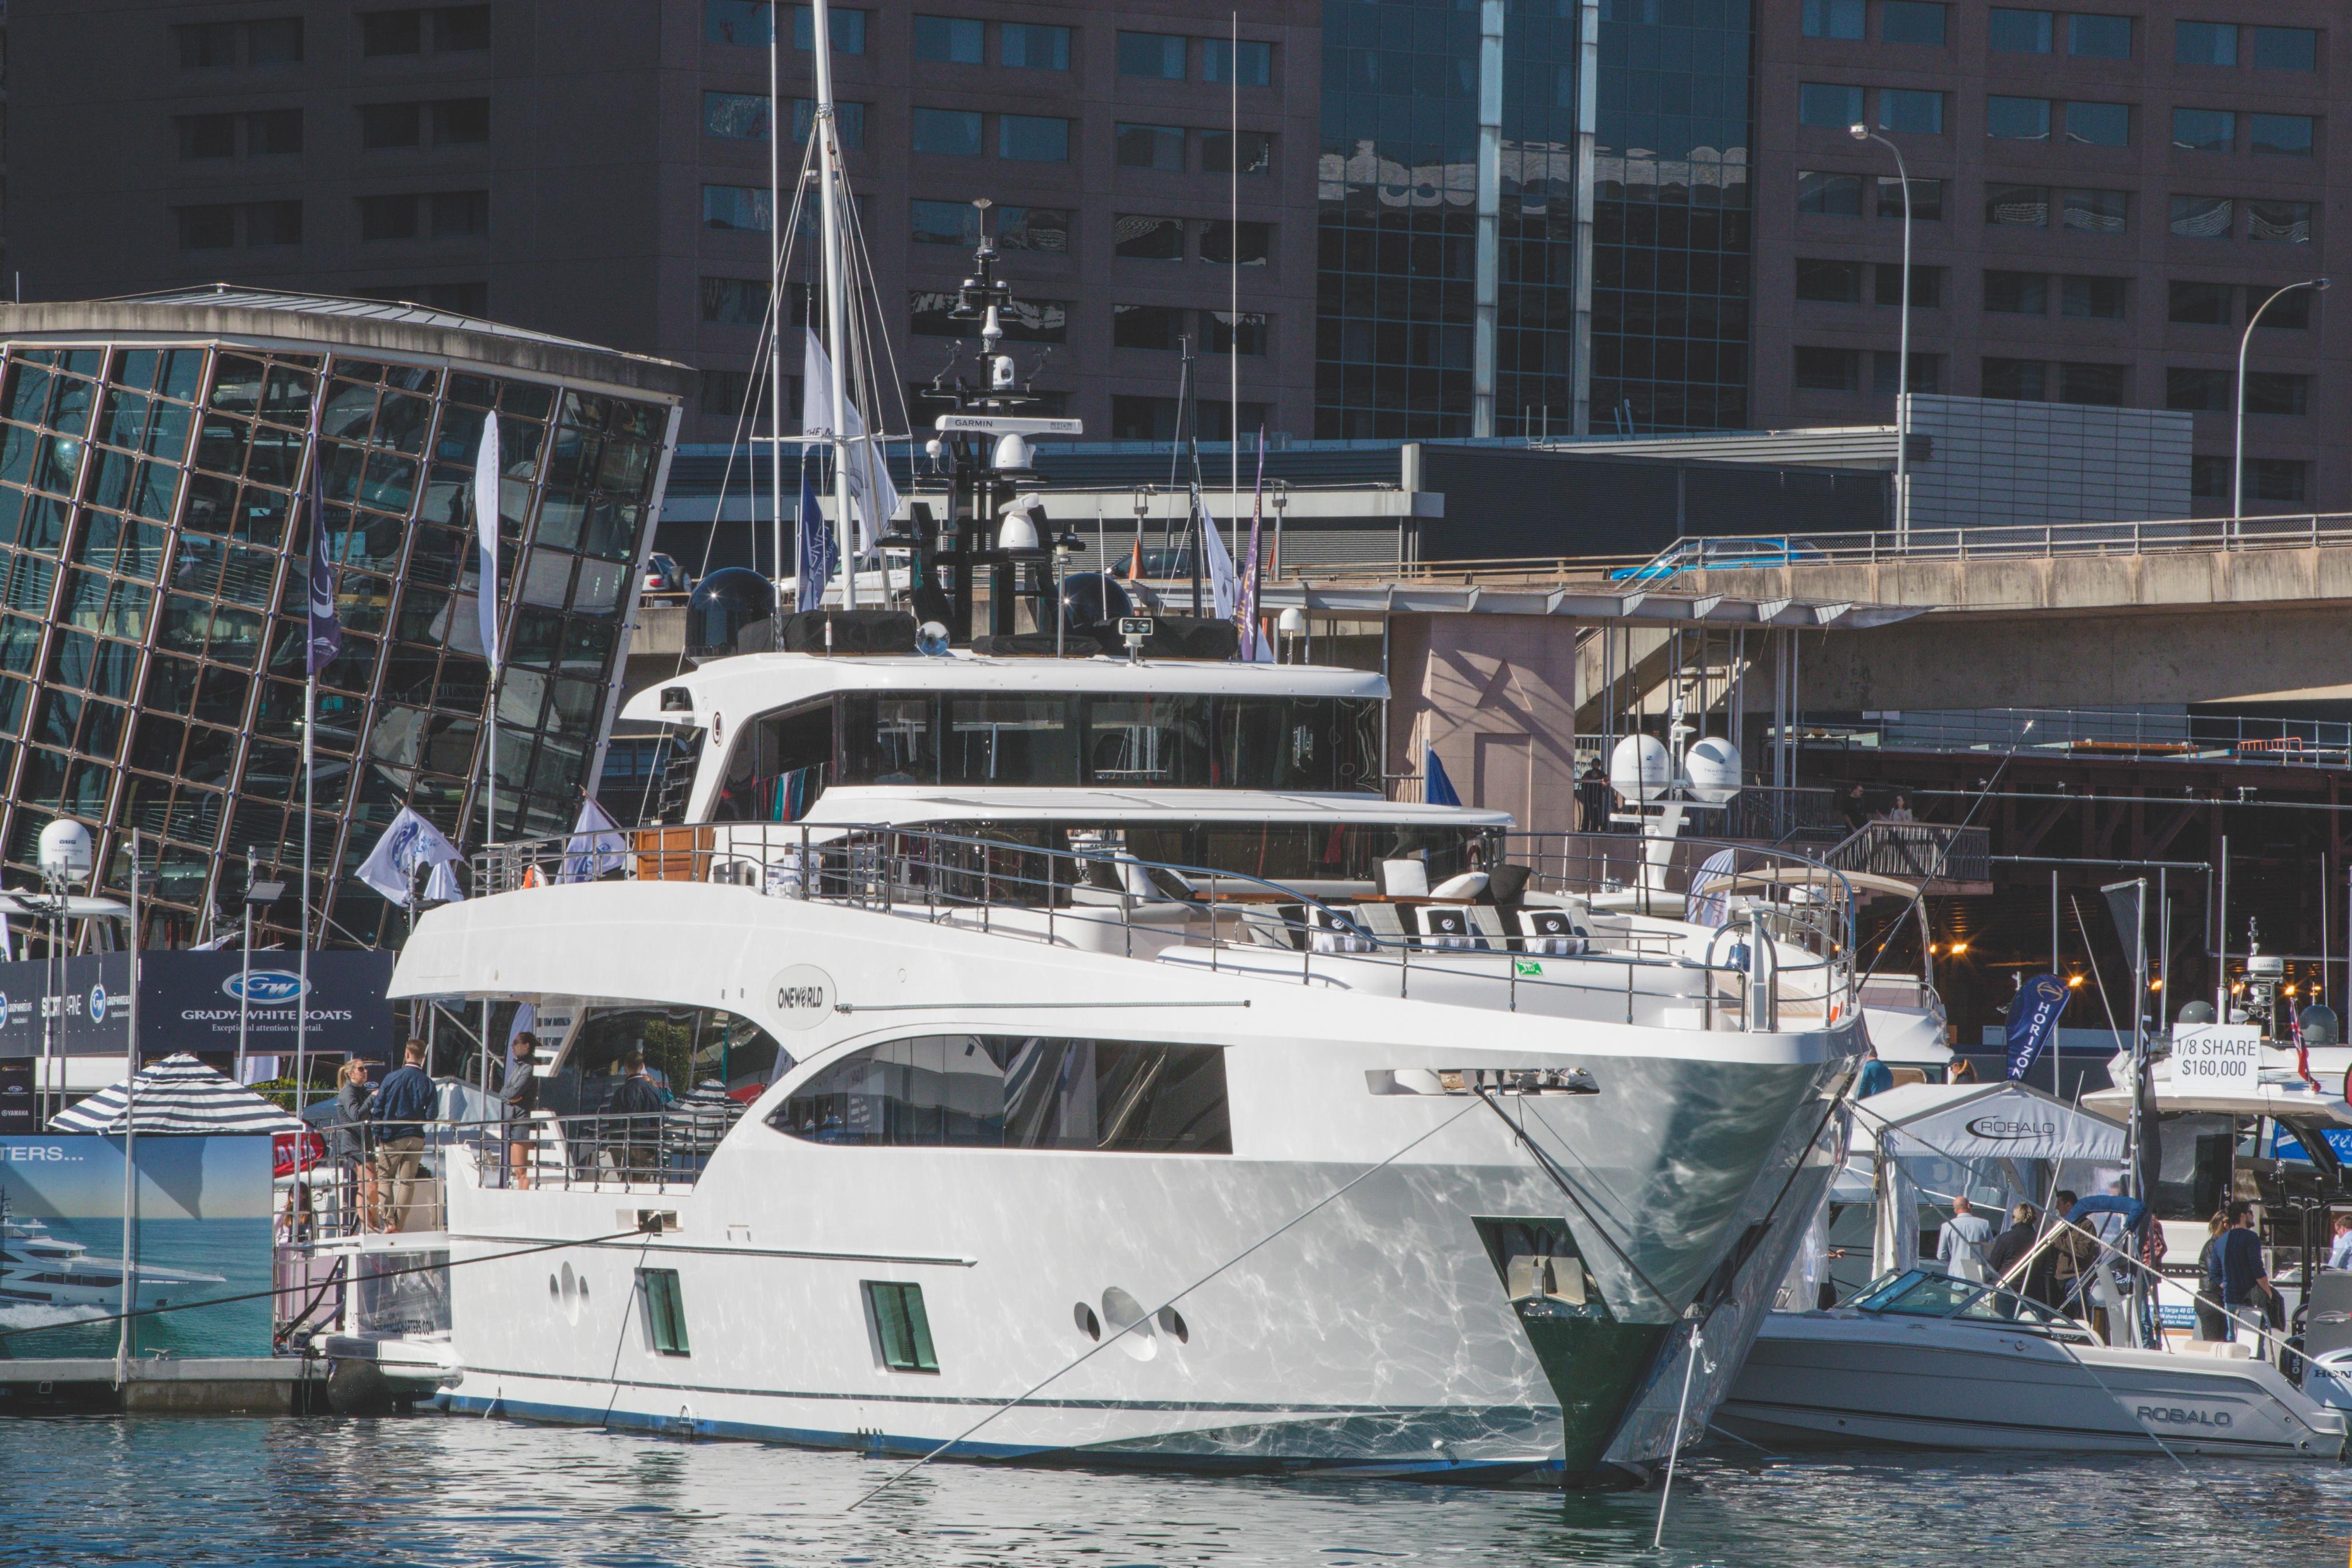 Gulf Craft at Sydney International Boat Show 2018 Day 3 (22).jpg